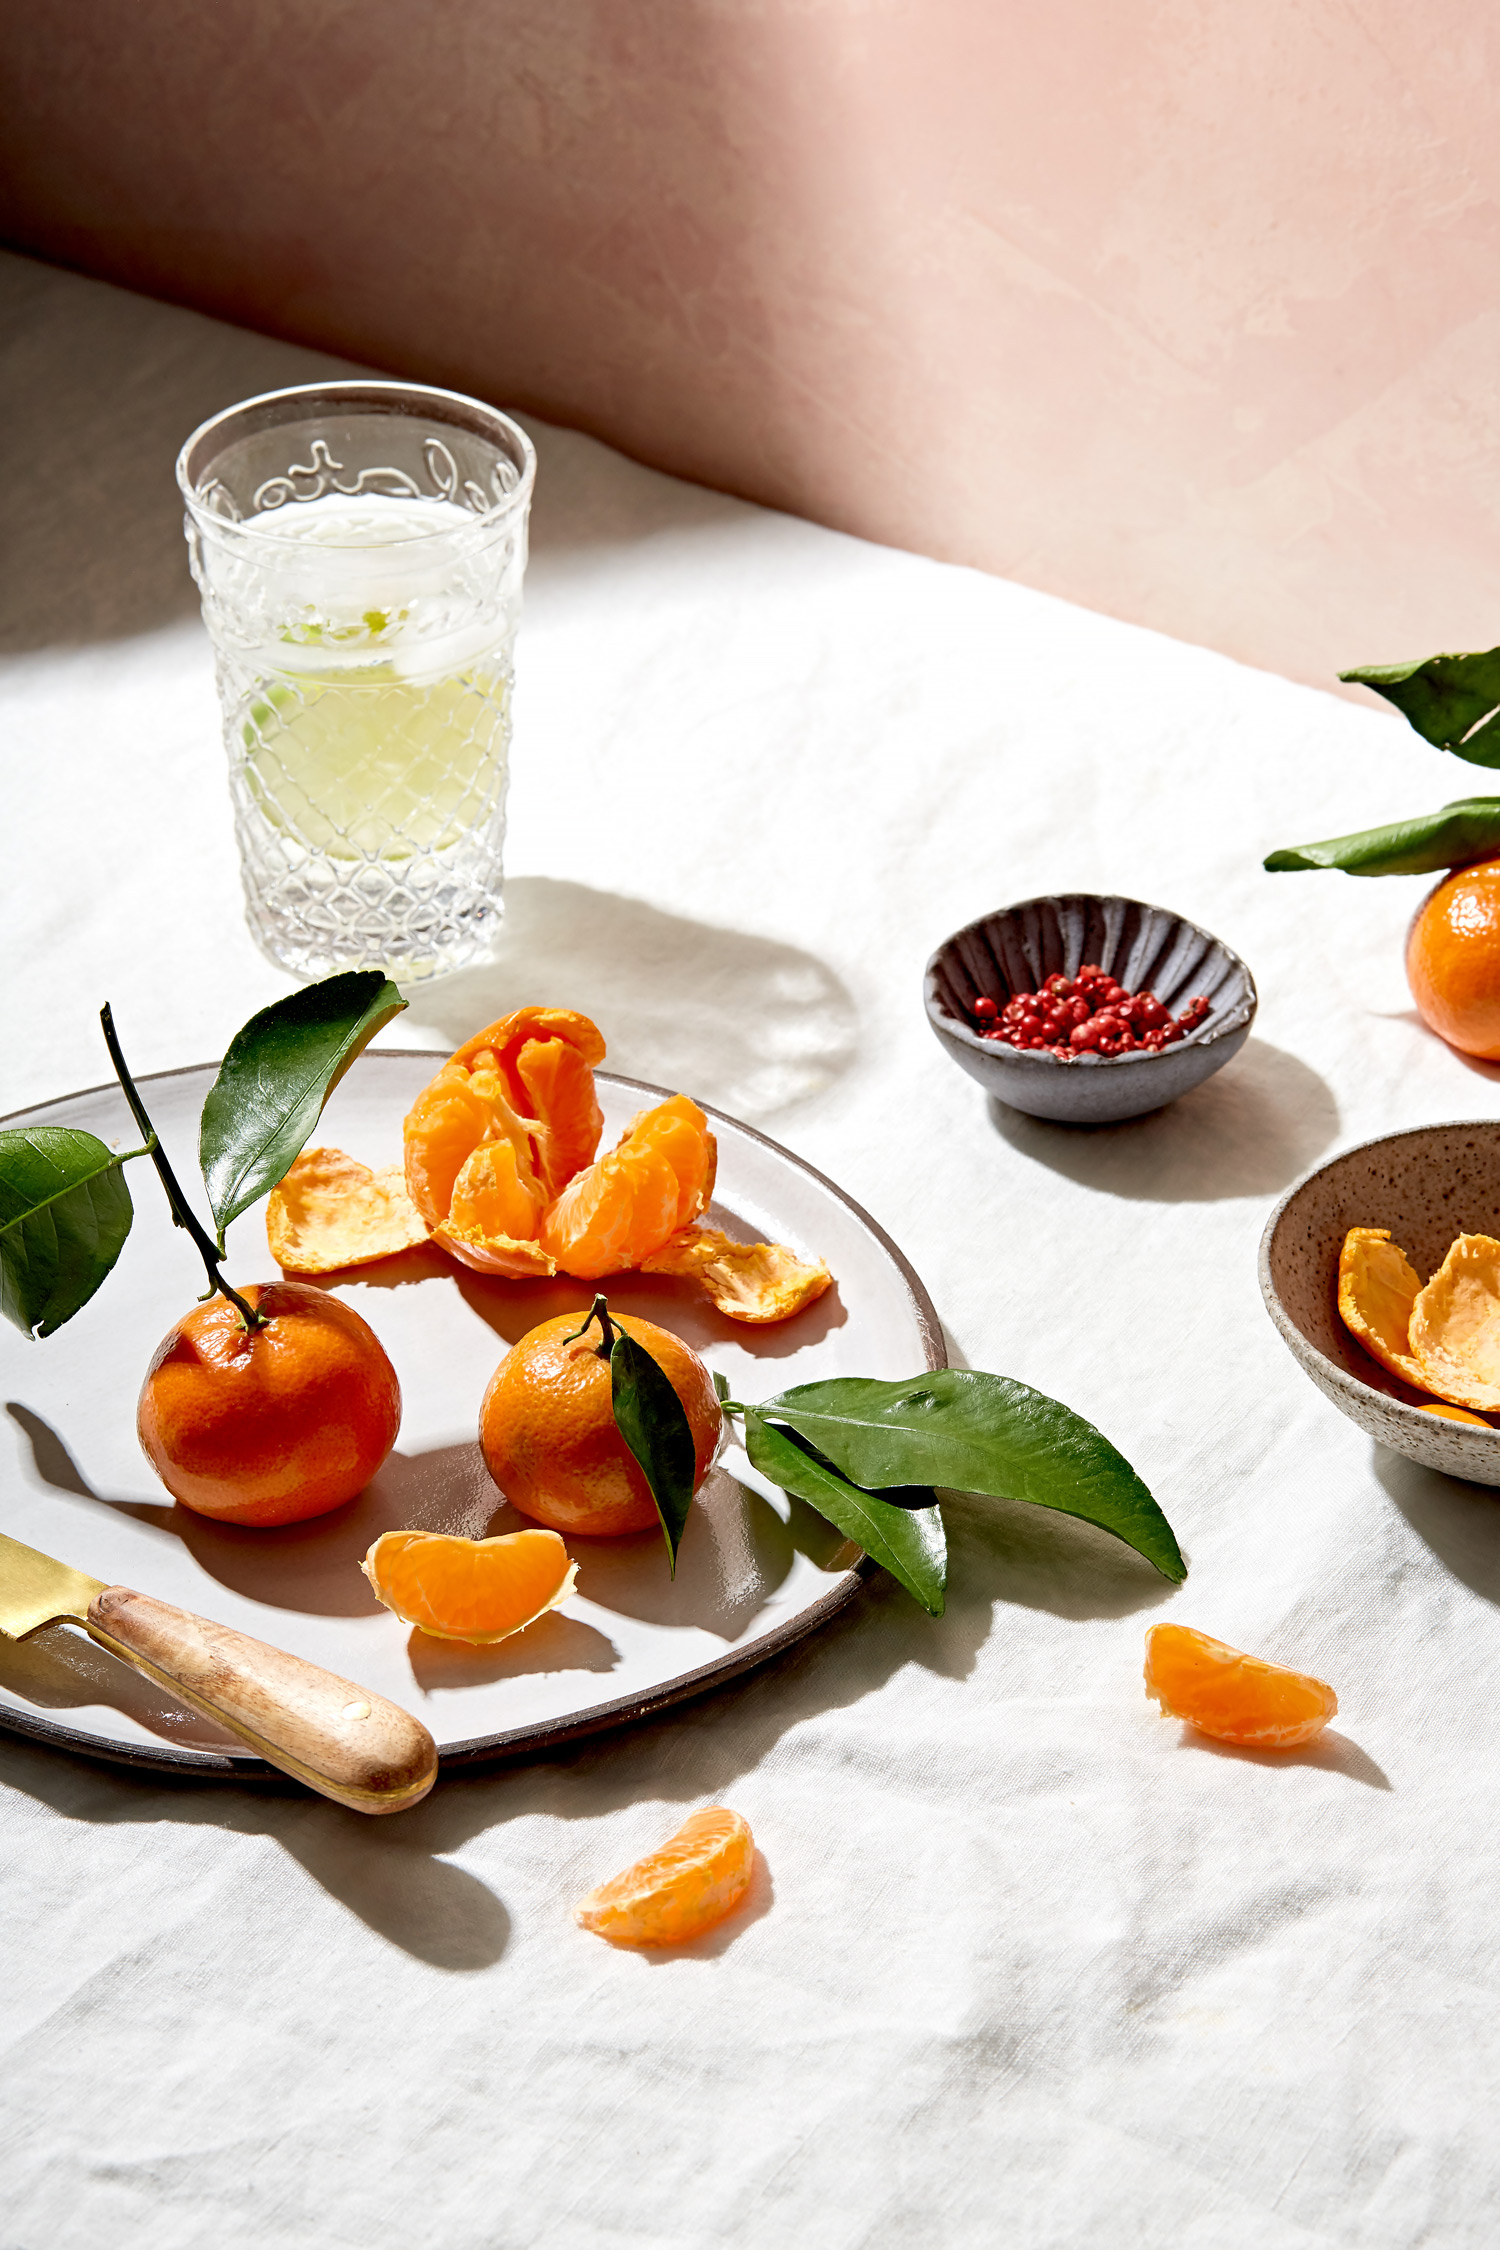 emily hawkes food photographer mandarin oranges